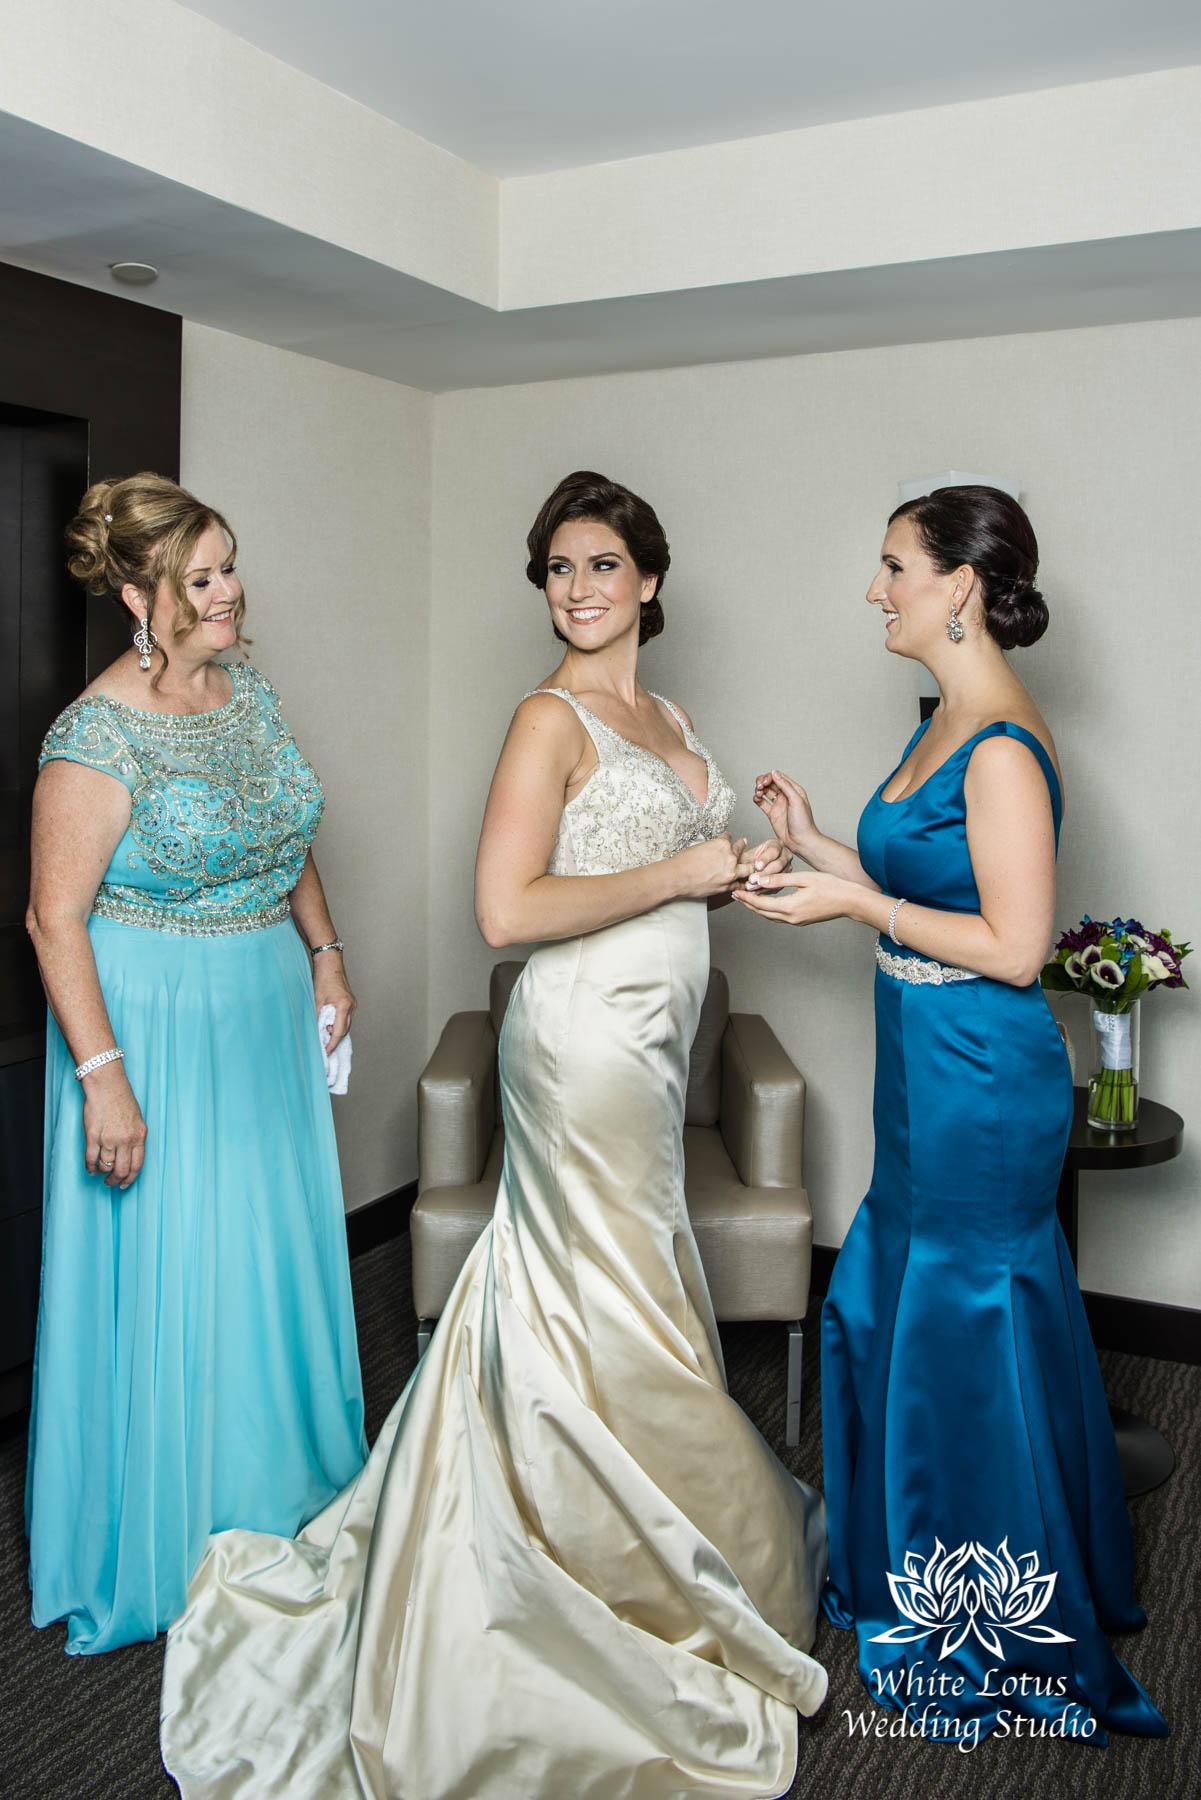 051 - Wedding - Toronto - Bride getting ready - PW